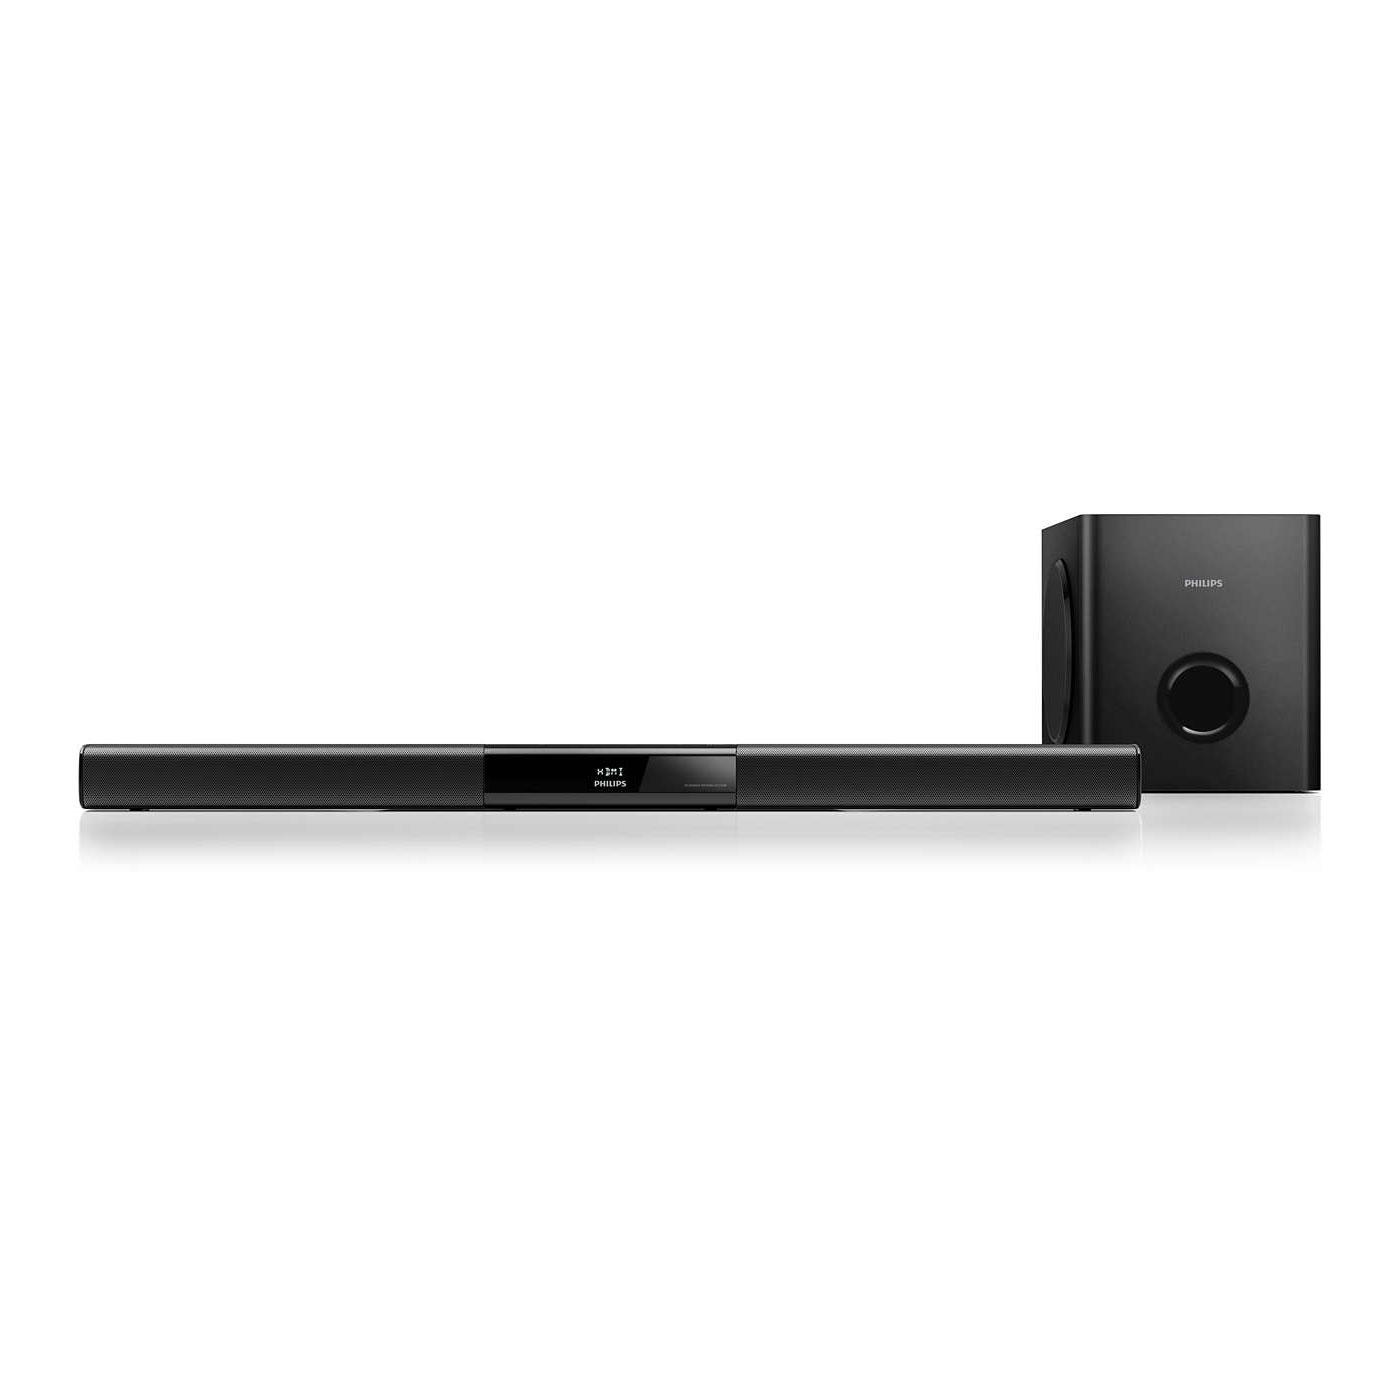 philips htl3110b barre de son philips sur. Black Bedroom Furniture Sets. Home Design Ideas